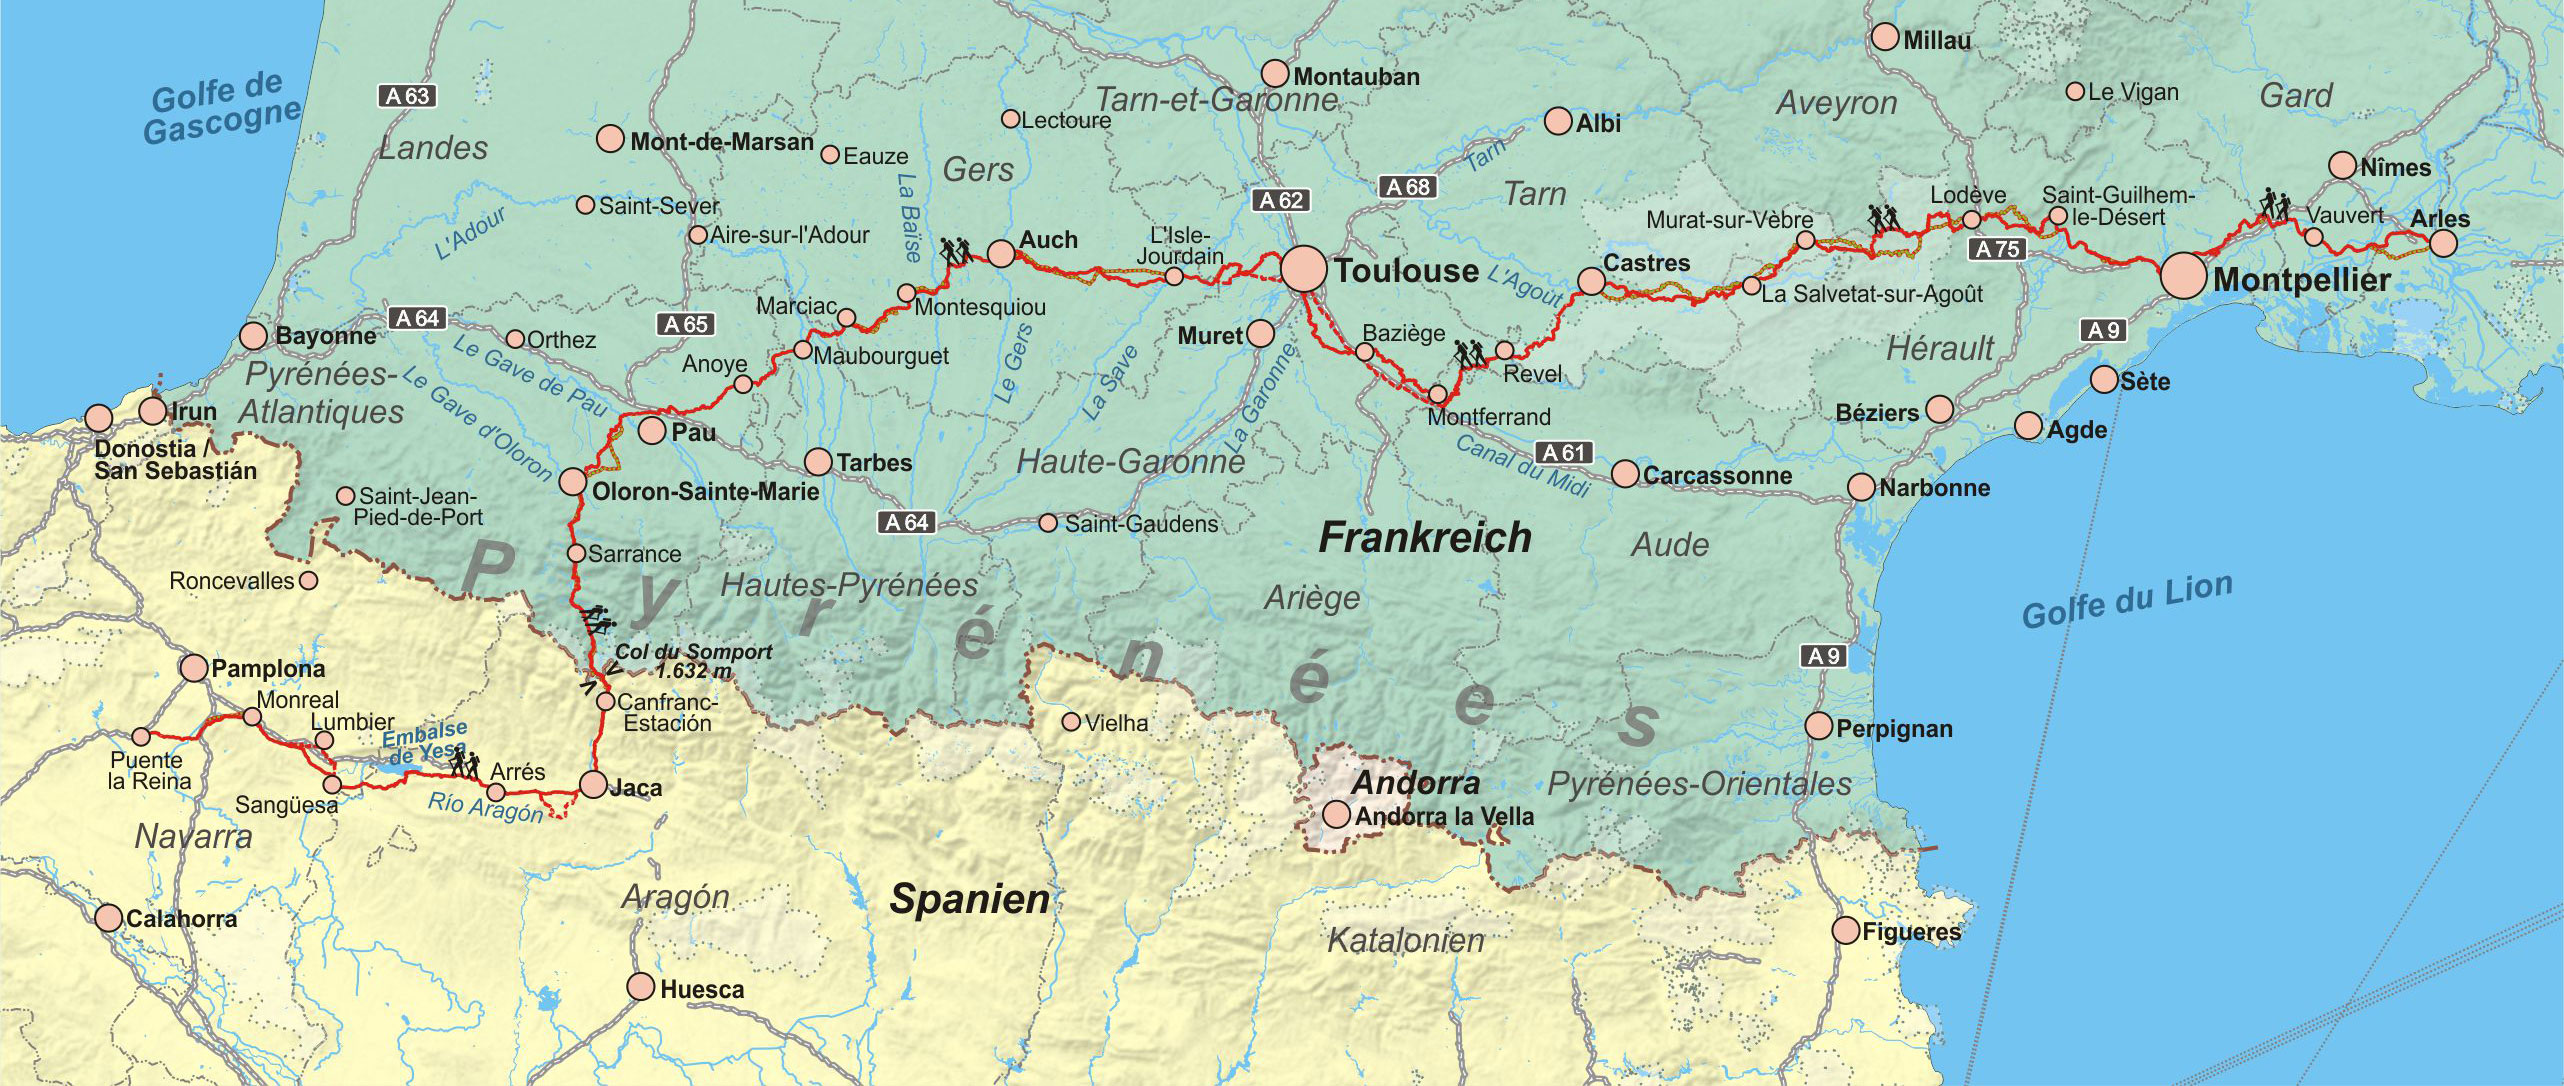 Frankreich: Jakobsweg Via Tolosana mit Camino Aragonés, Spanien